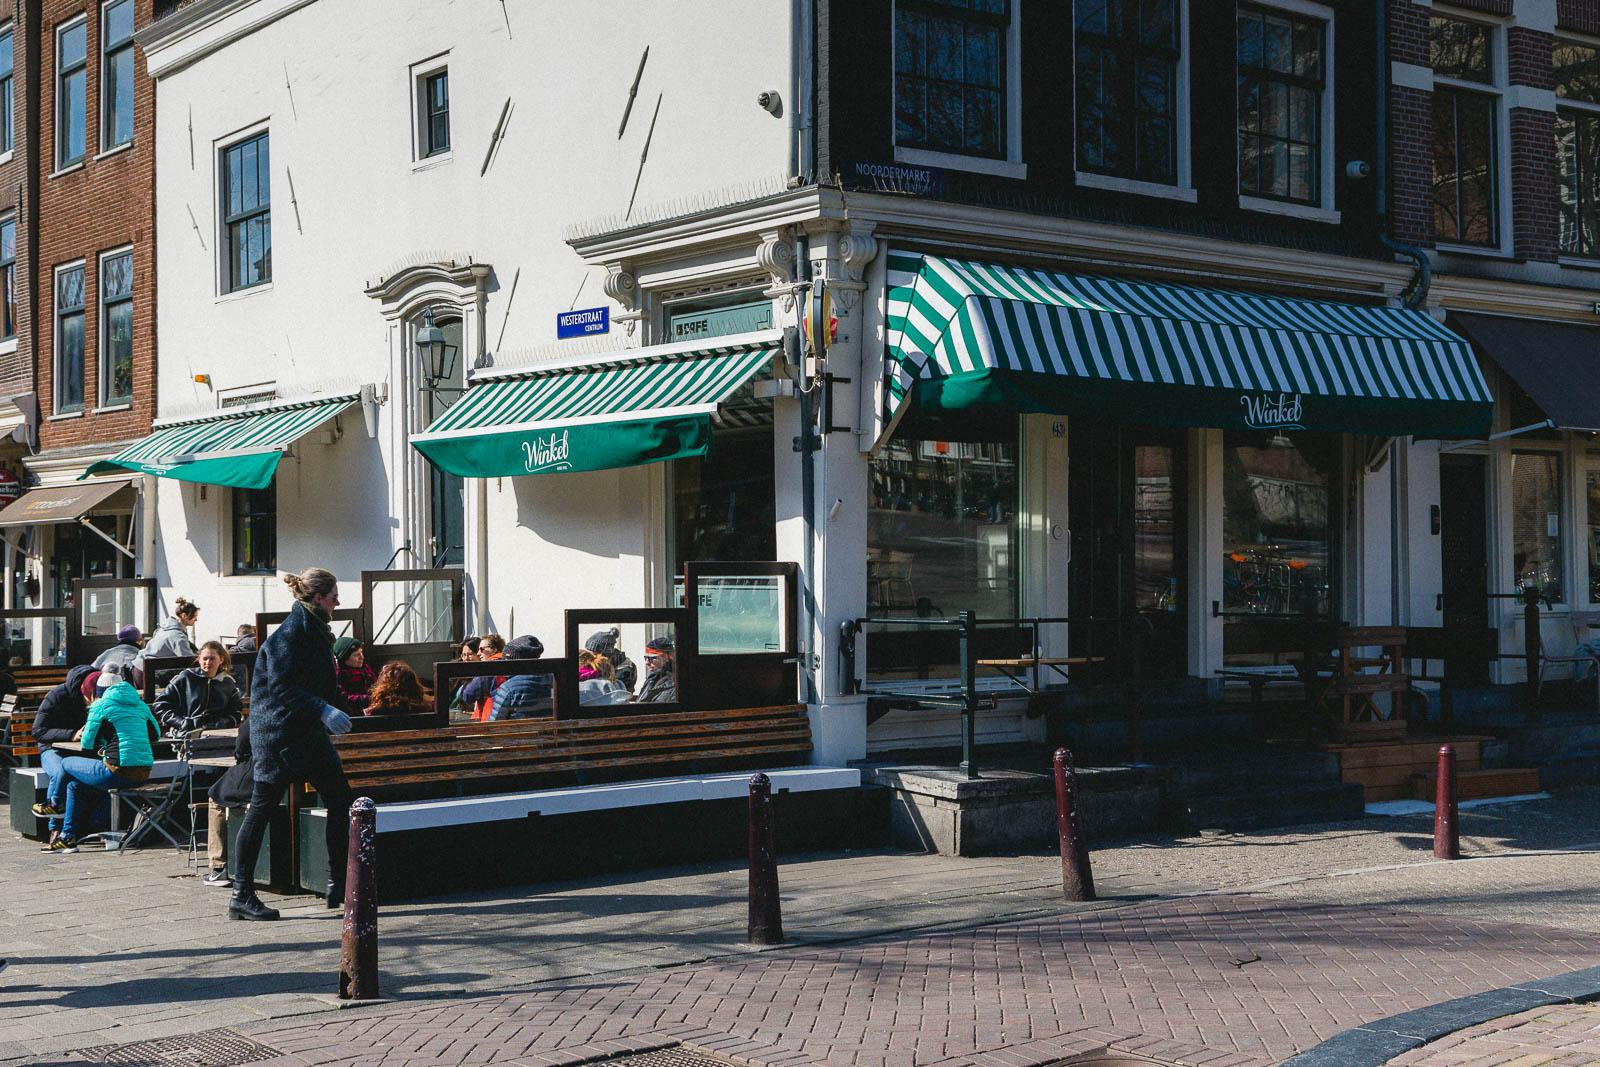 Amsterdam Reiseblog - Cafe Winkel